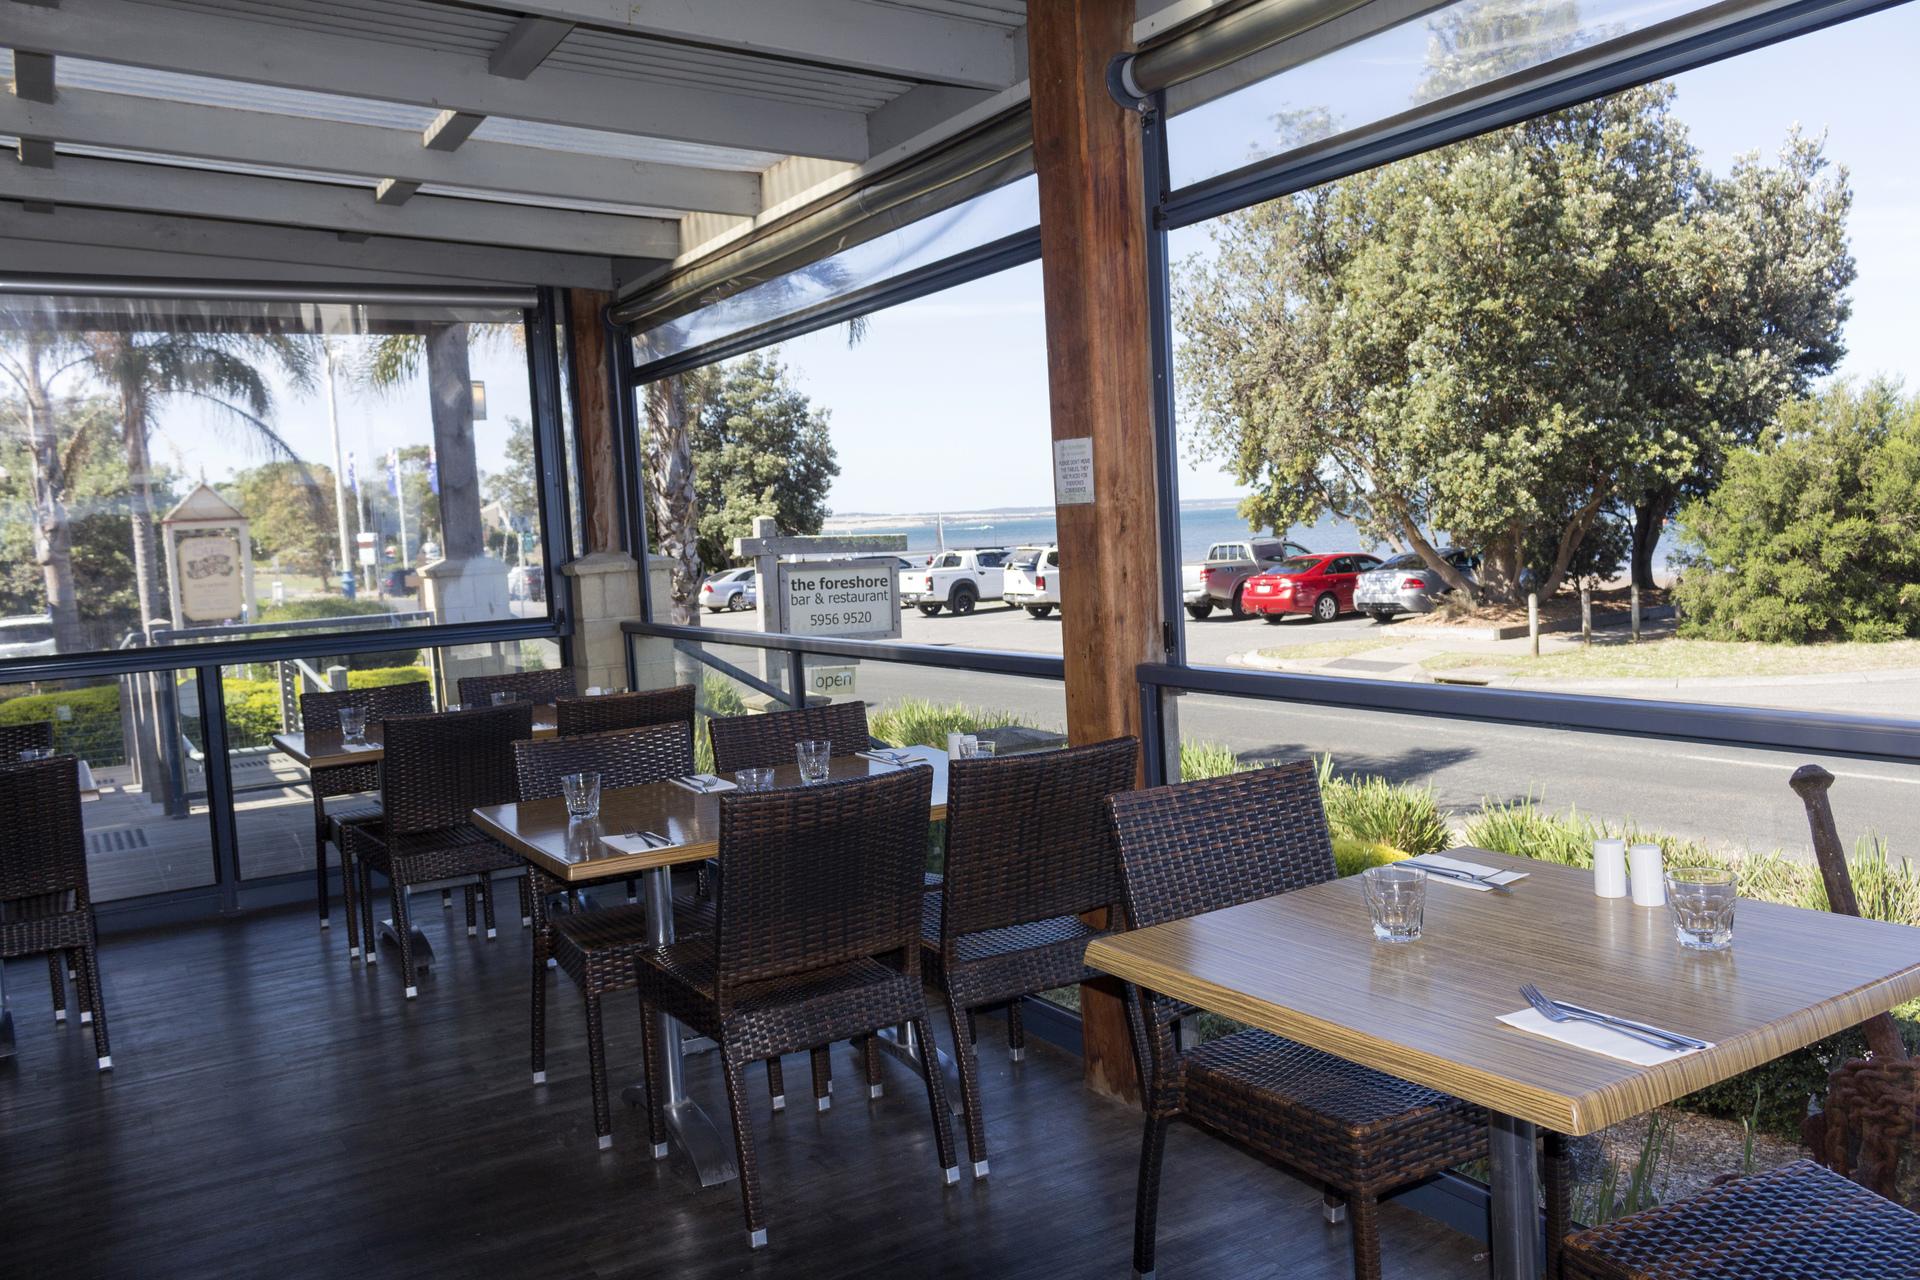 e - The Foreshore Bar & Restaurant